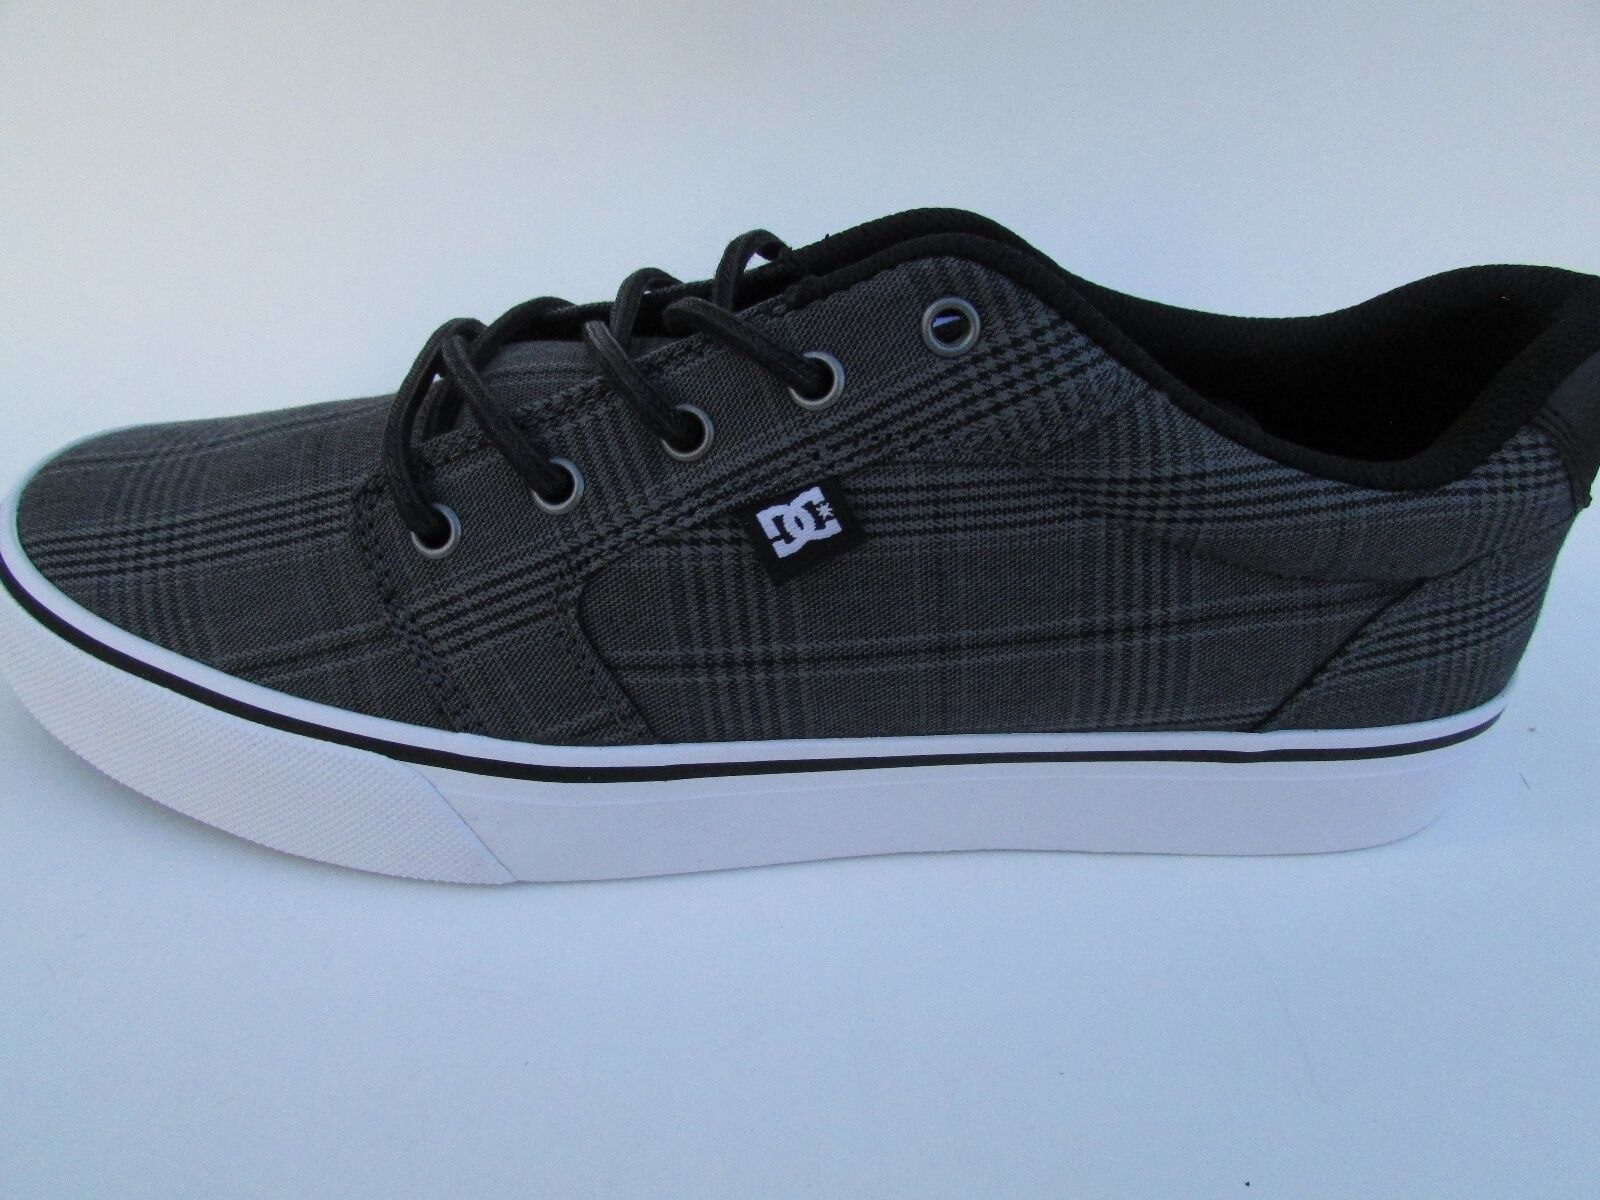 DC Men's Anvil TX SE Sneaker BLACK WHITE GREY (XKWS)  ADYS300036